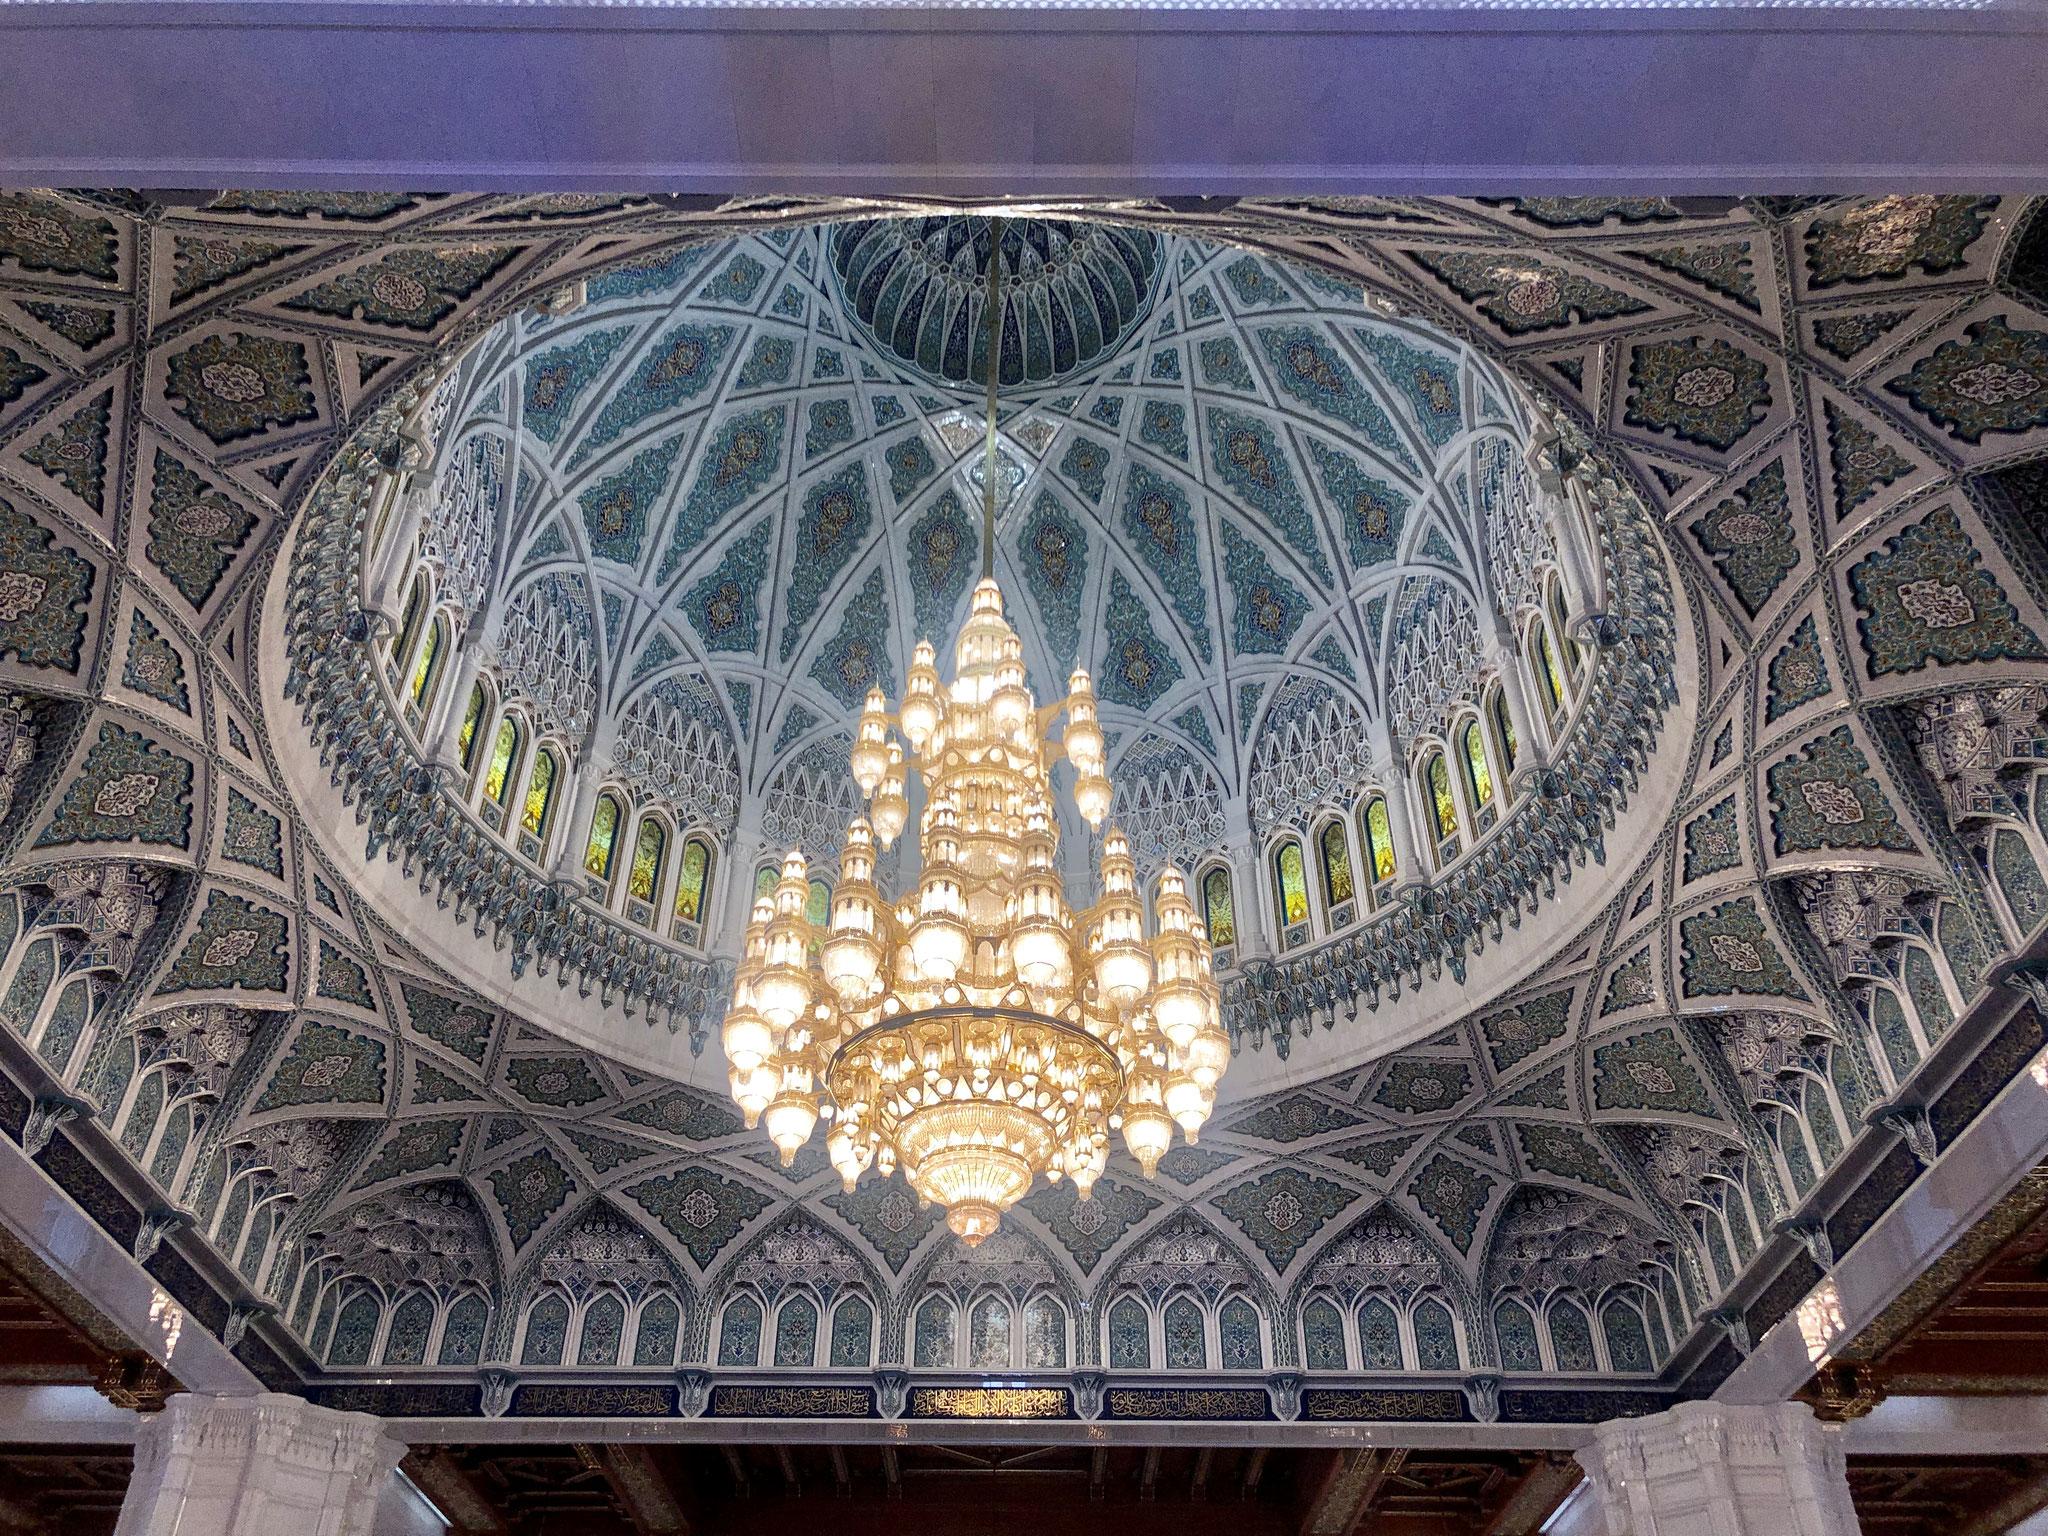 Chandelier Sultan Qaboos Grand Mosque